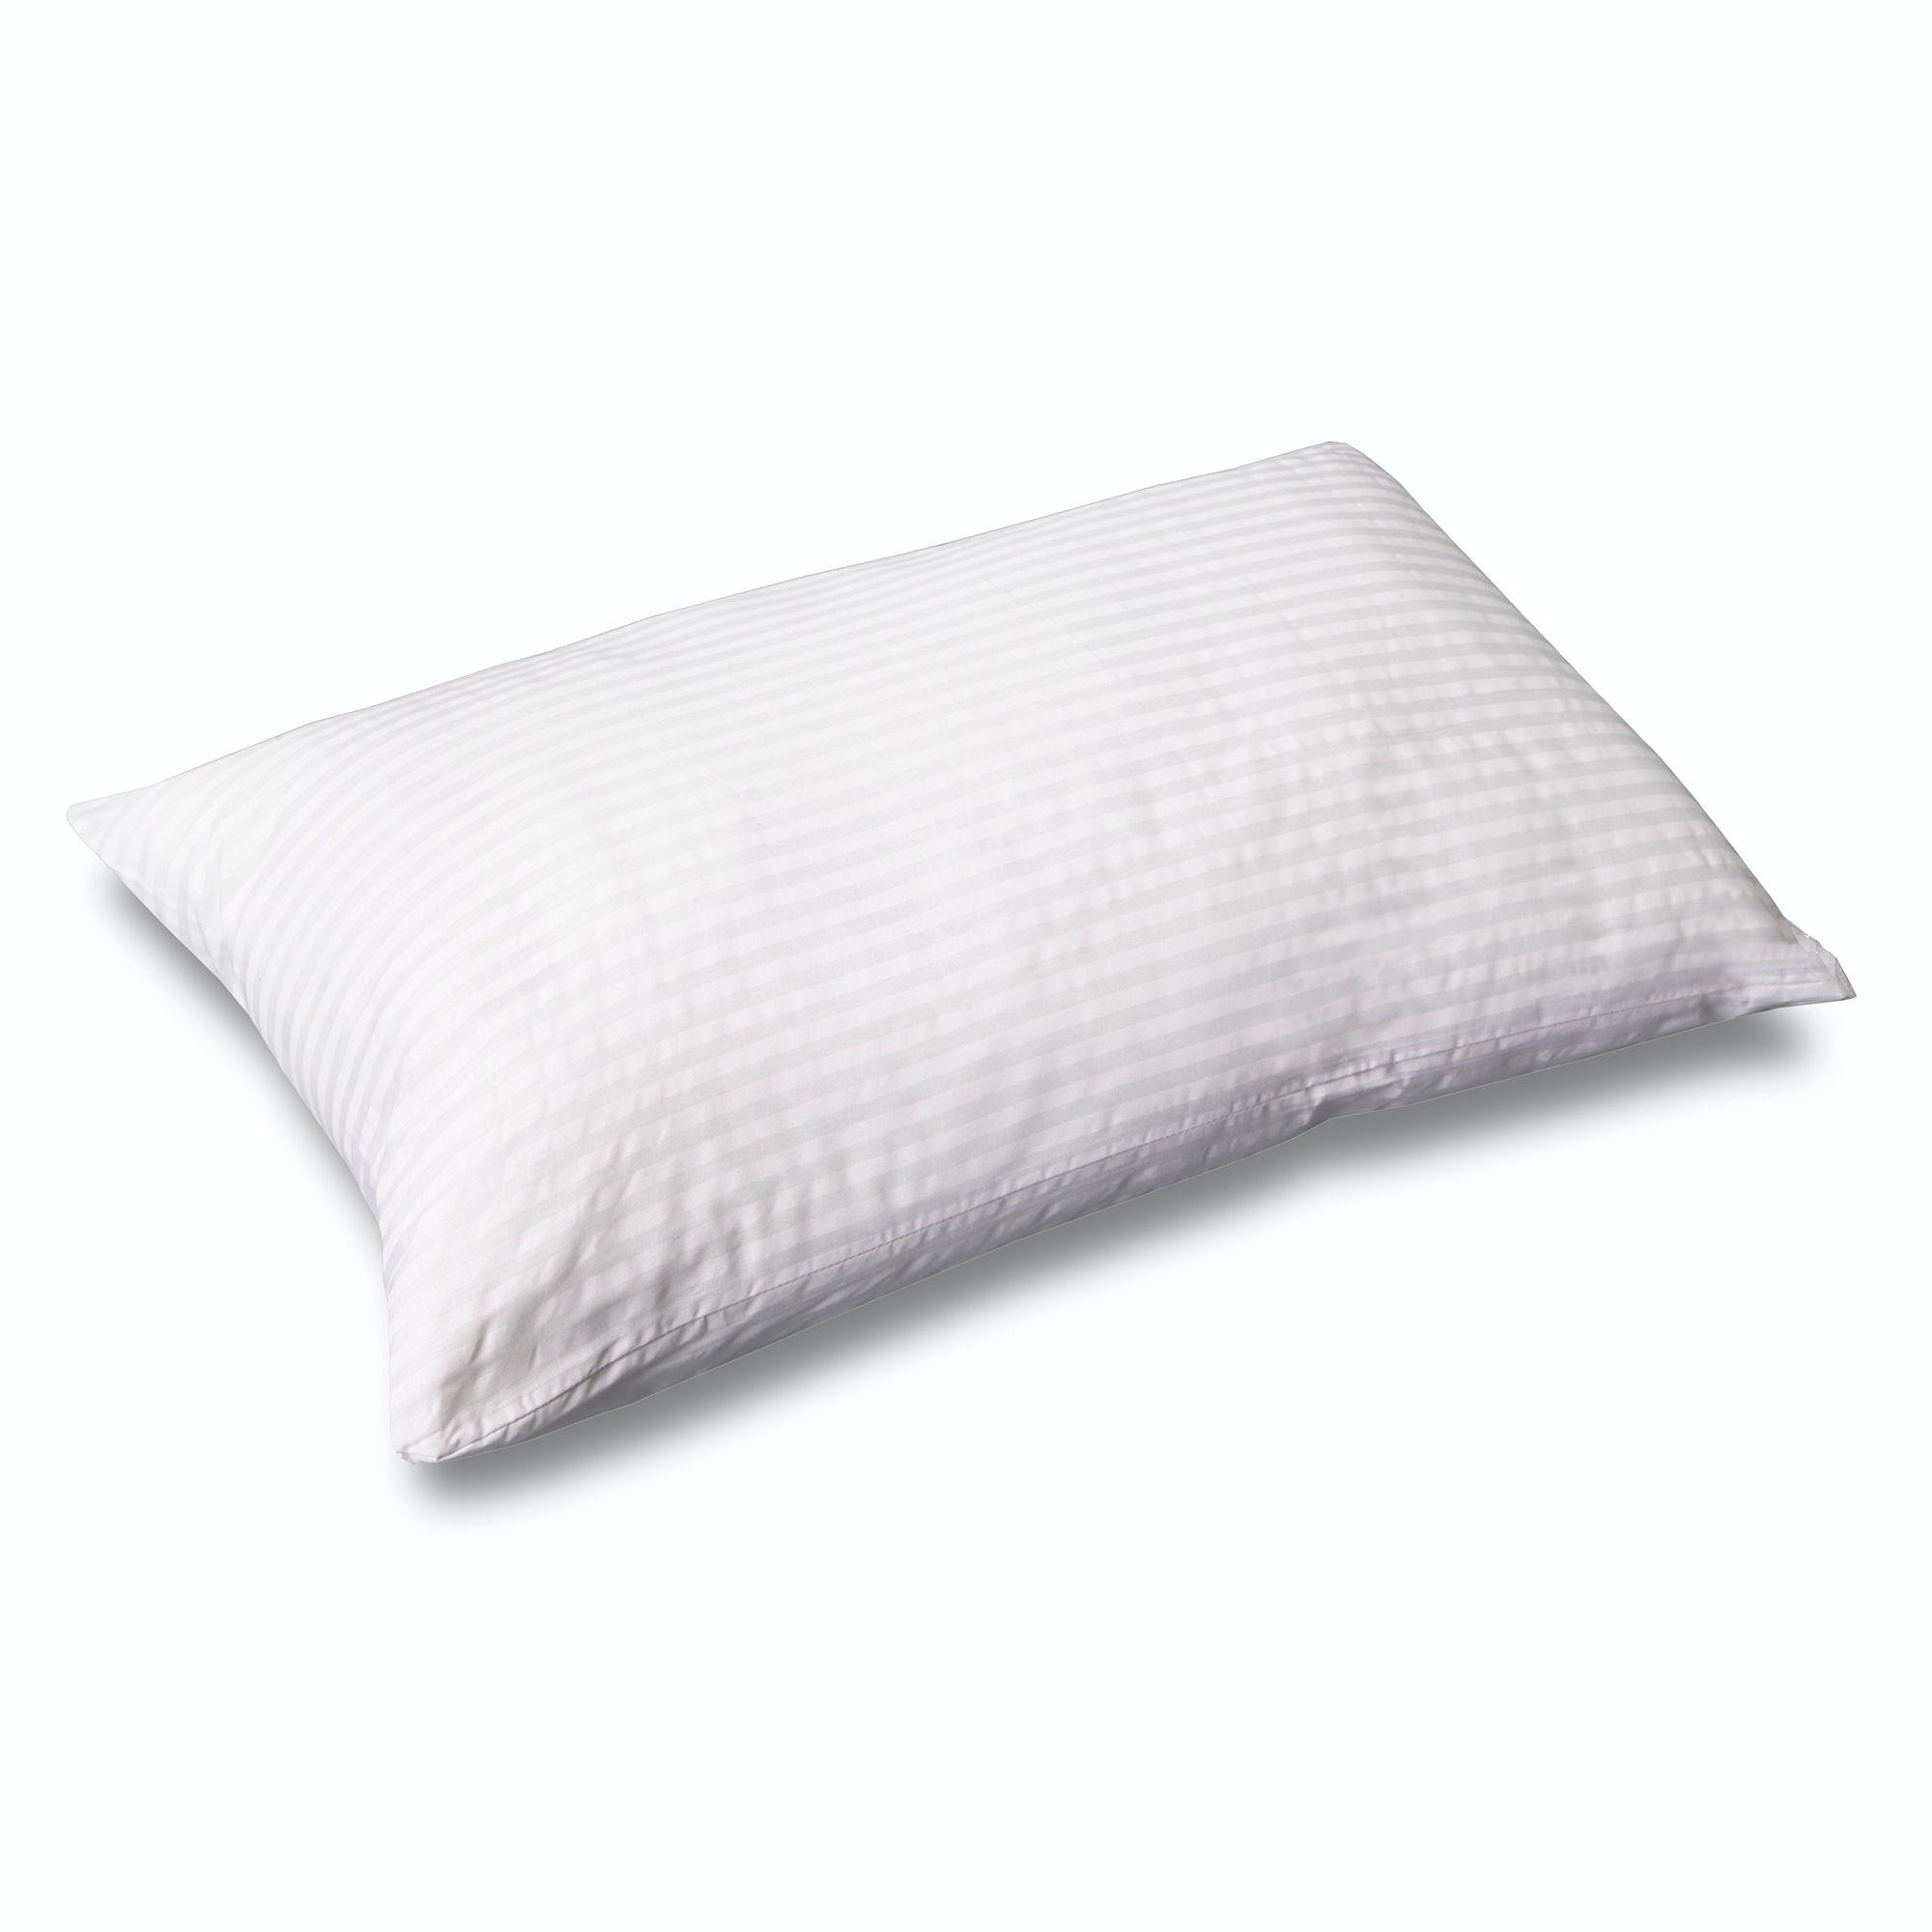 fashion bed group sleep plush advanced support microcubed latex foam pillow standard